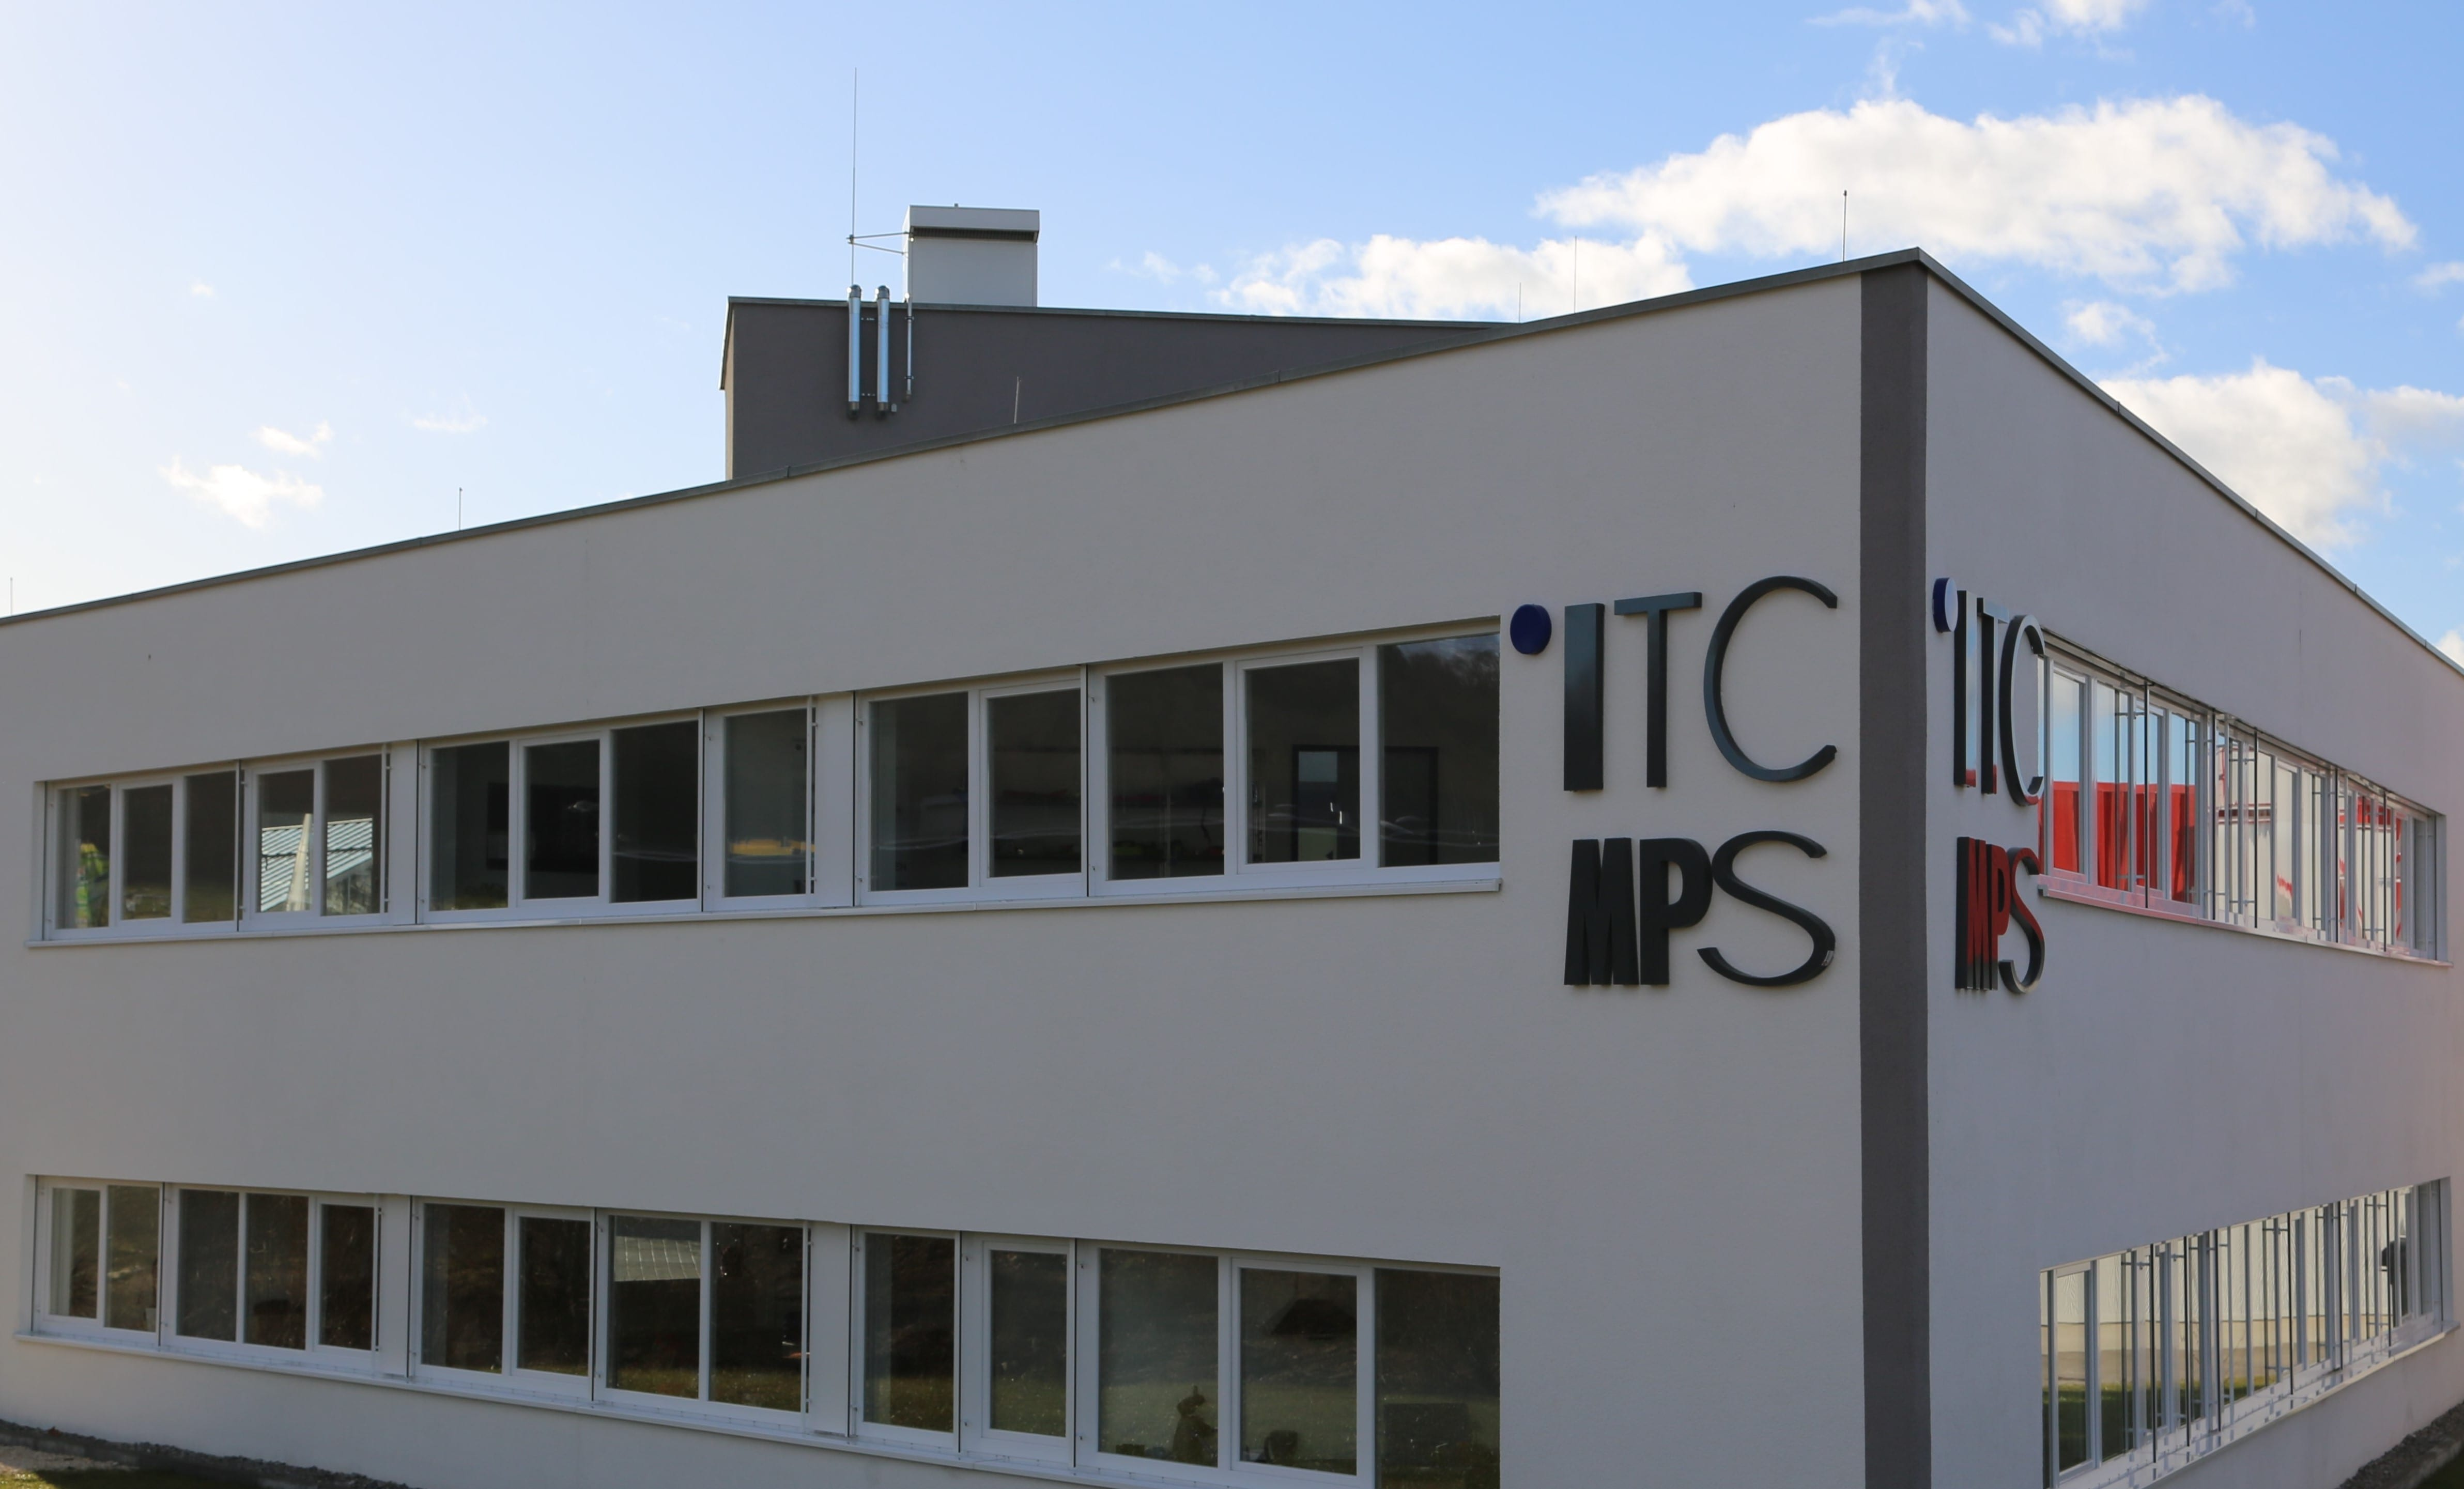 ITC Graf GmbH